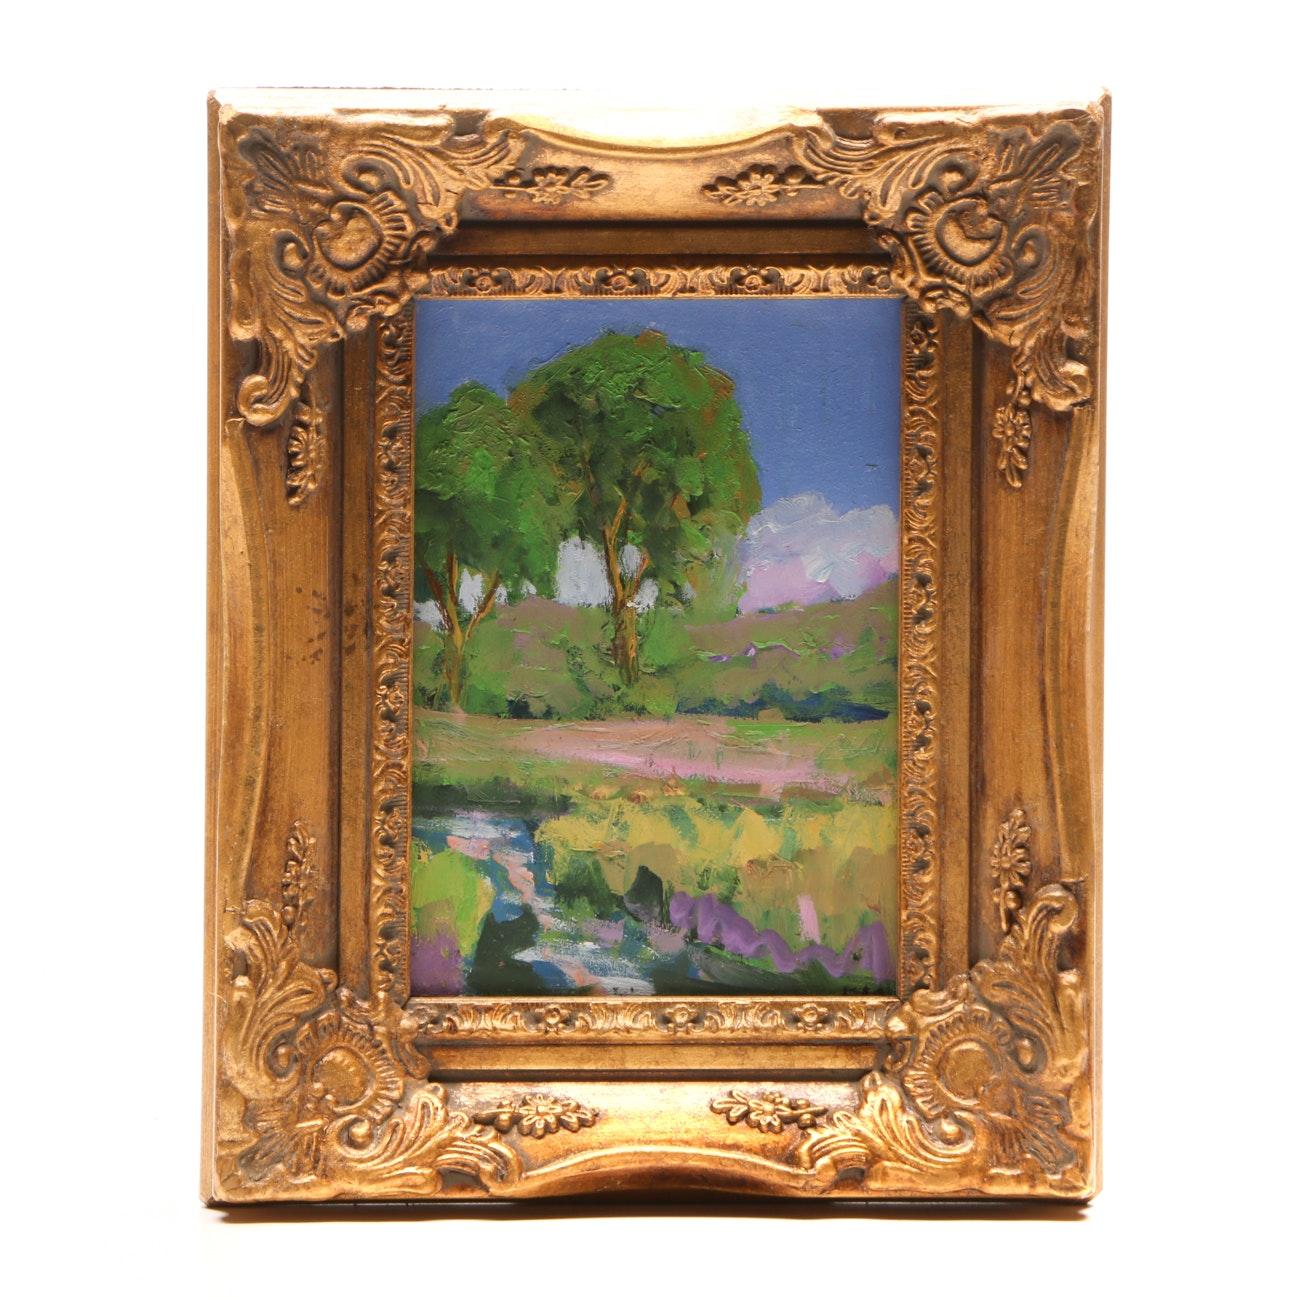 Ken Burnside Impressionist Oil Painting on Masonite of Verdant Landscape